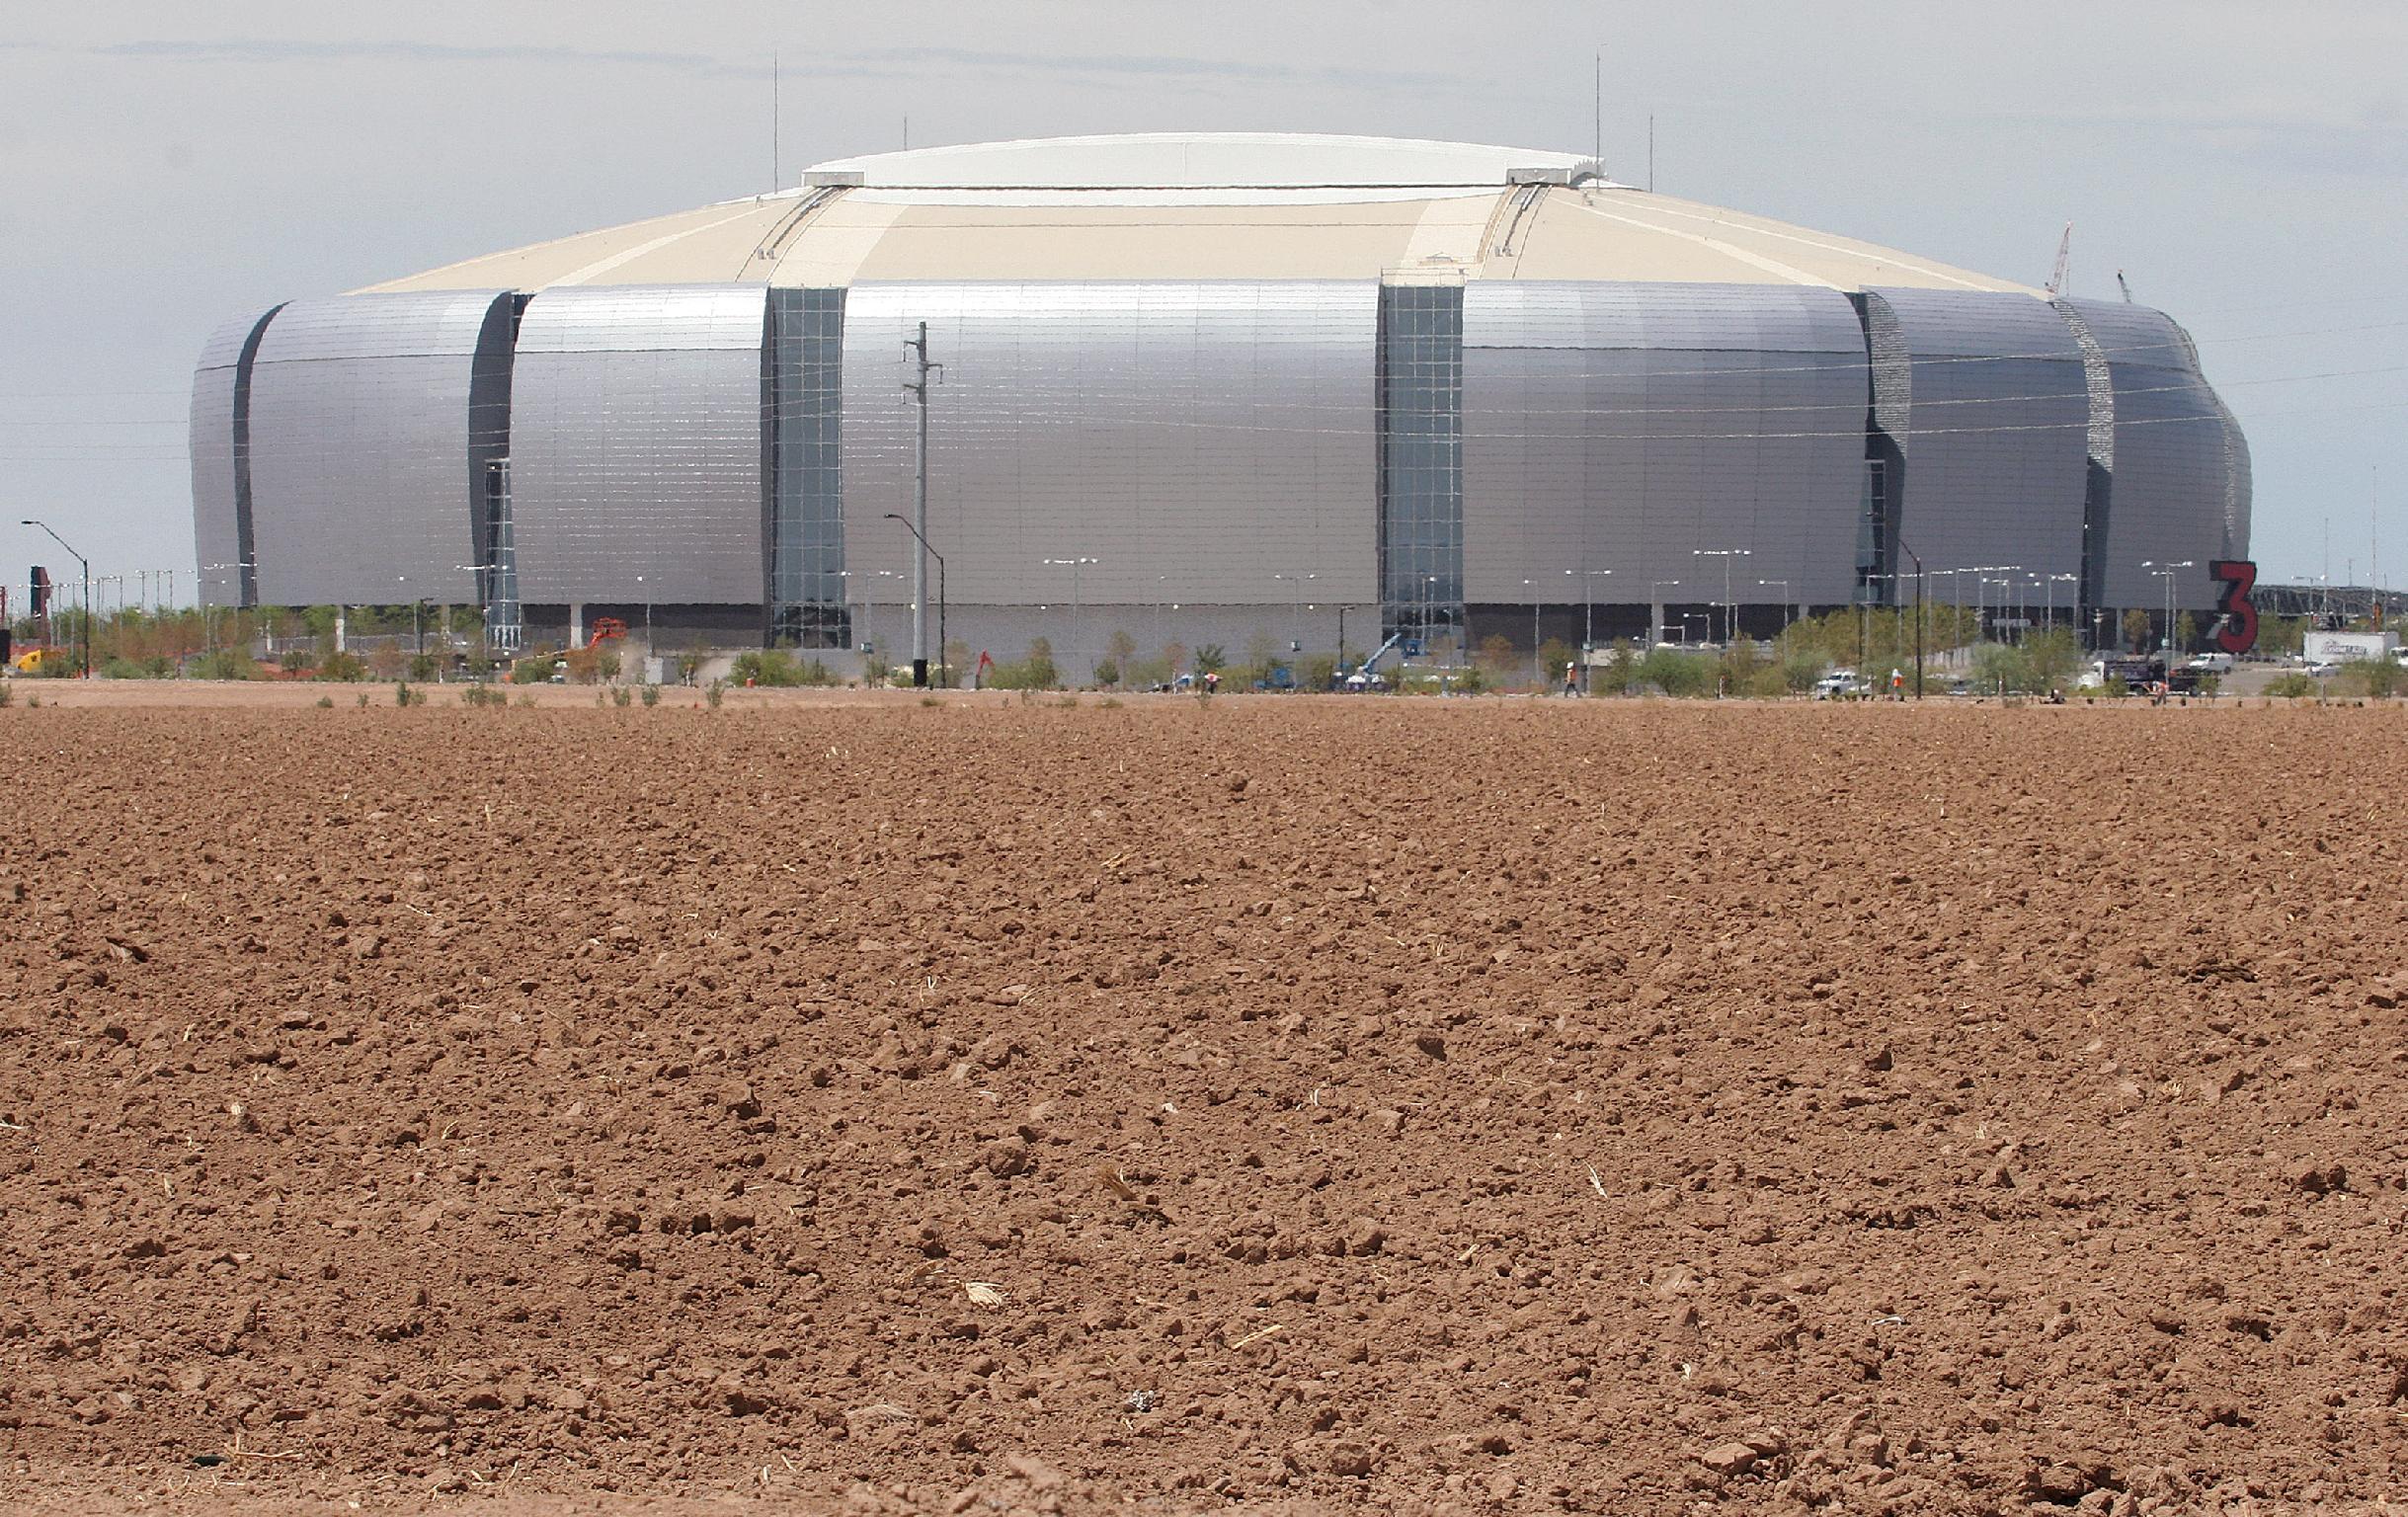 Glendale, Ariz., Tampa, Fla., to host title games